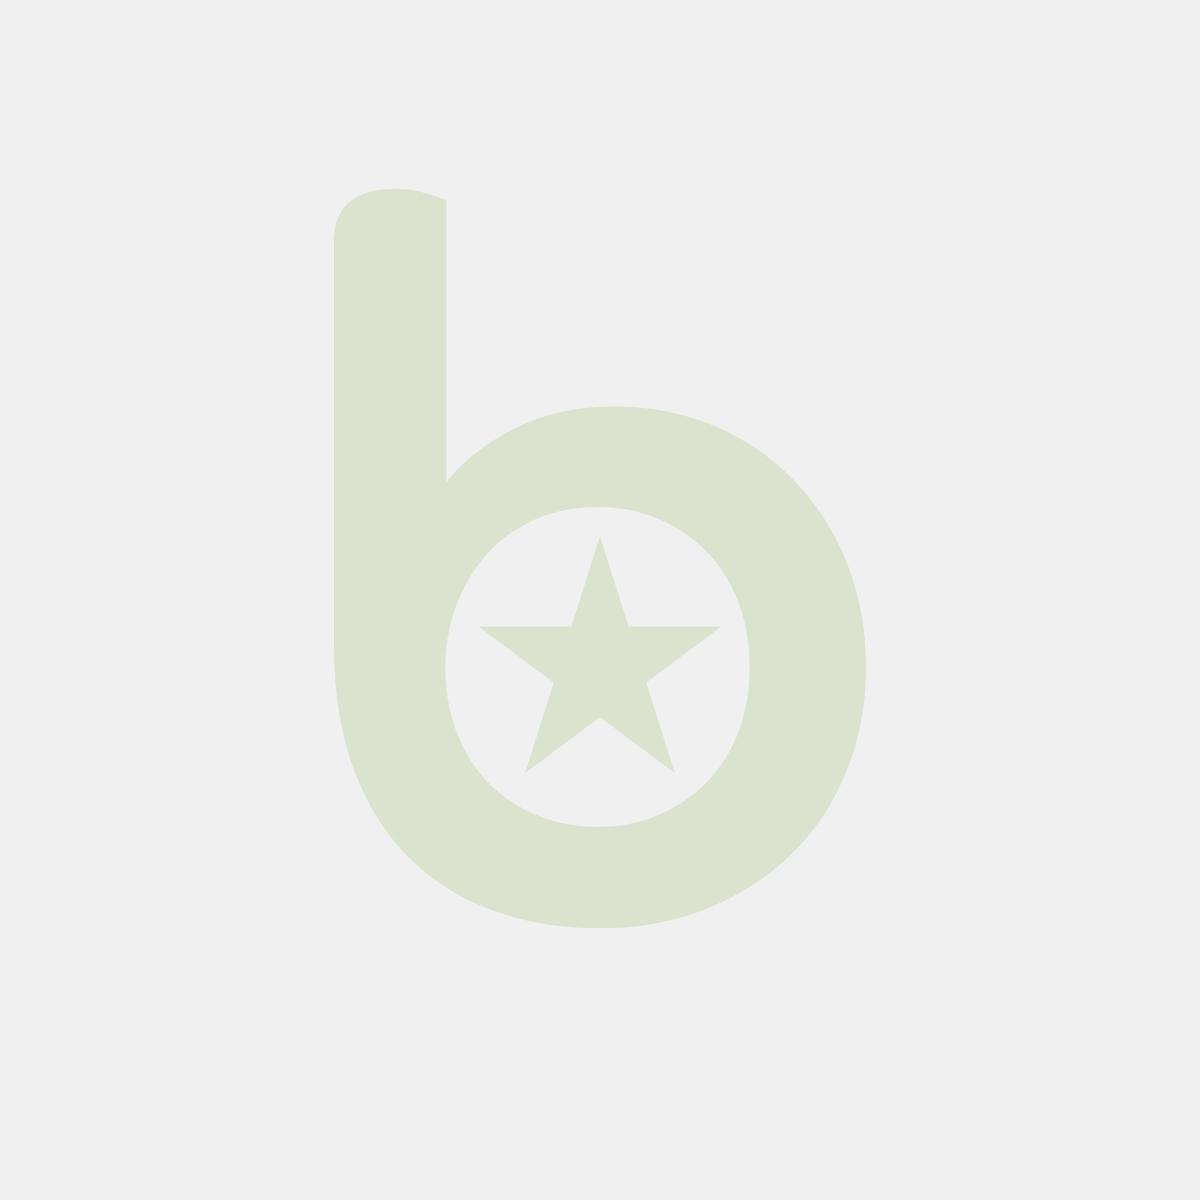 Bieżnik PAPSTAR ROYAL Collection w rolce 24m/40cm szampański, bibuła